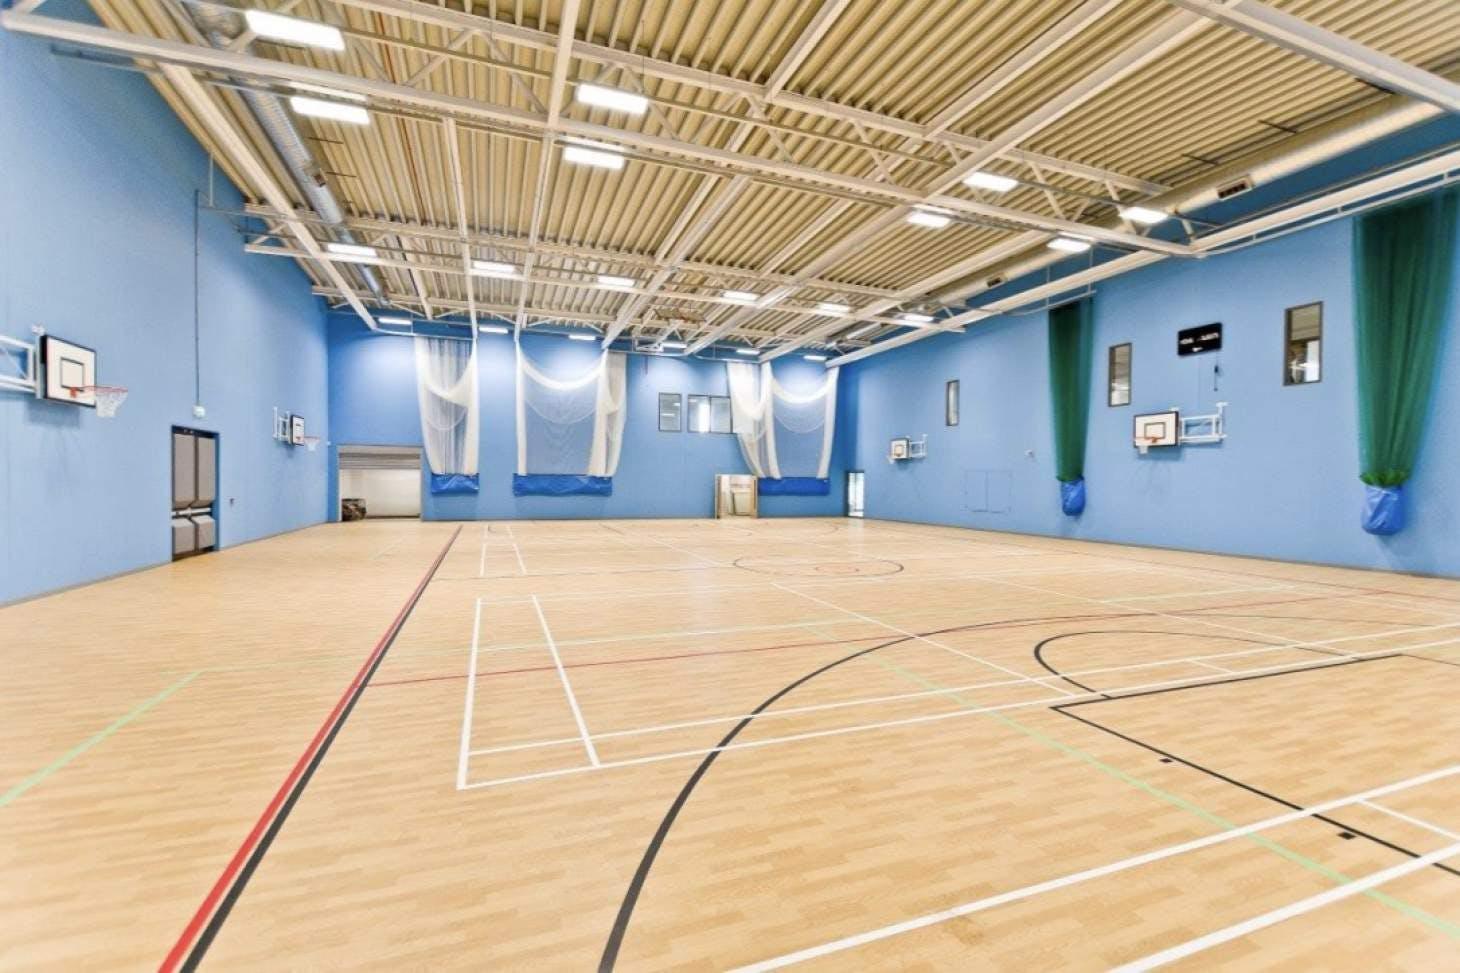 Beaumont School Court | Sports hall badminton court